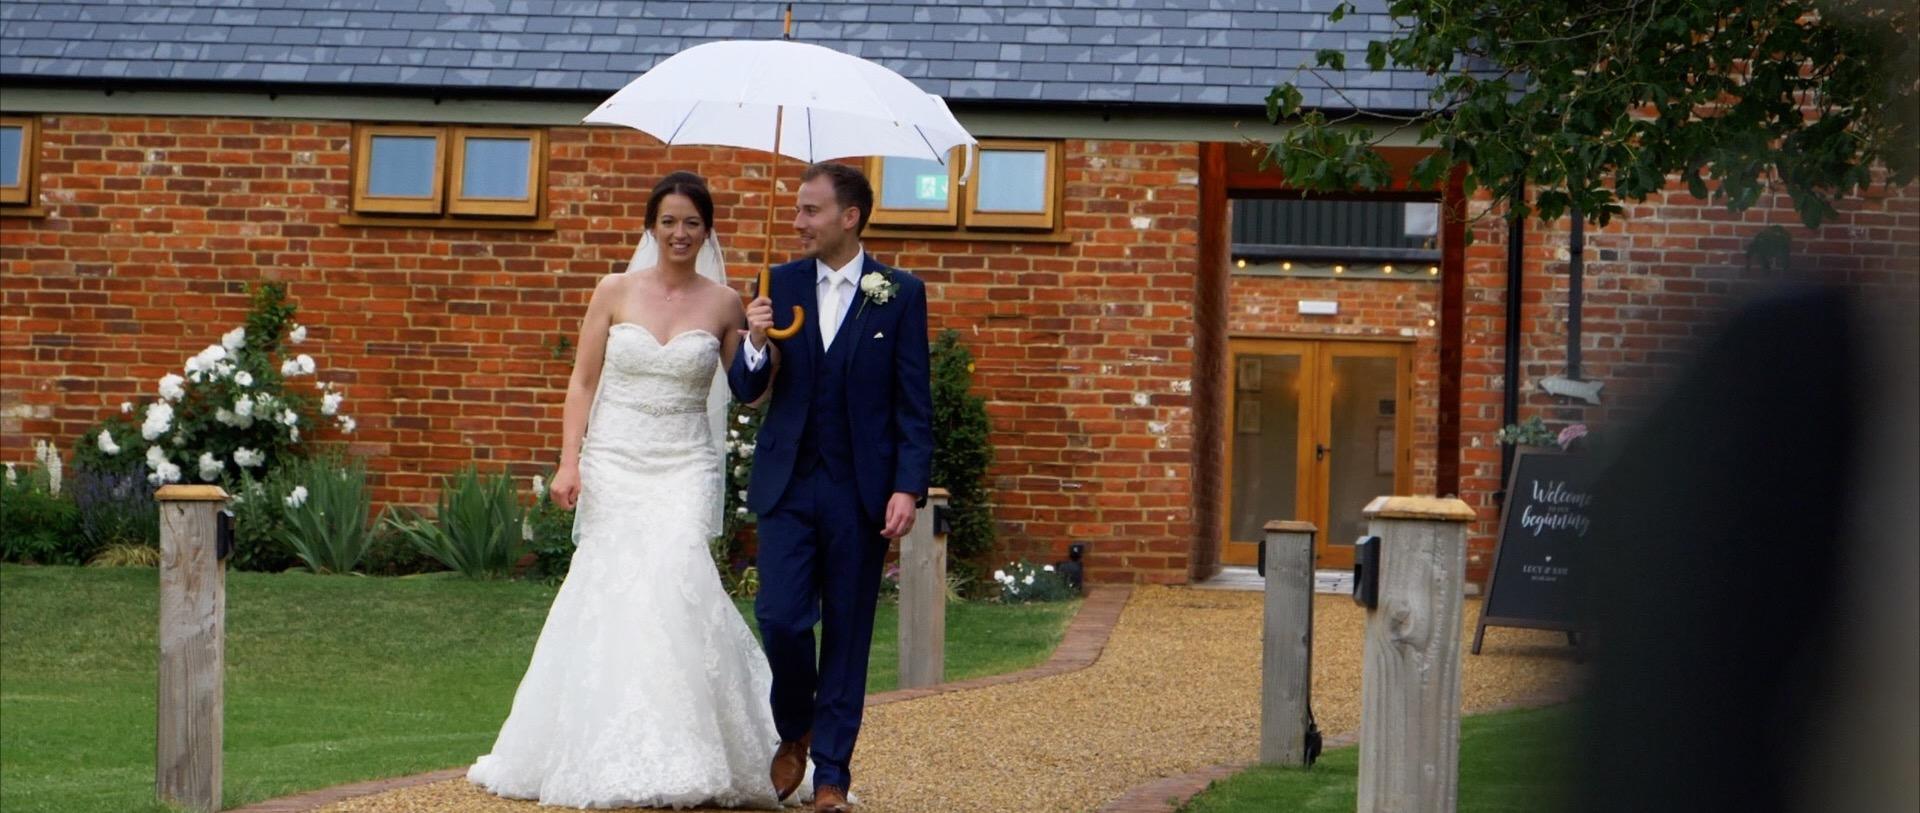 Apton Hall Rain wedding video.jpg